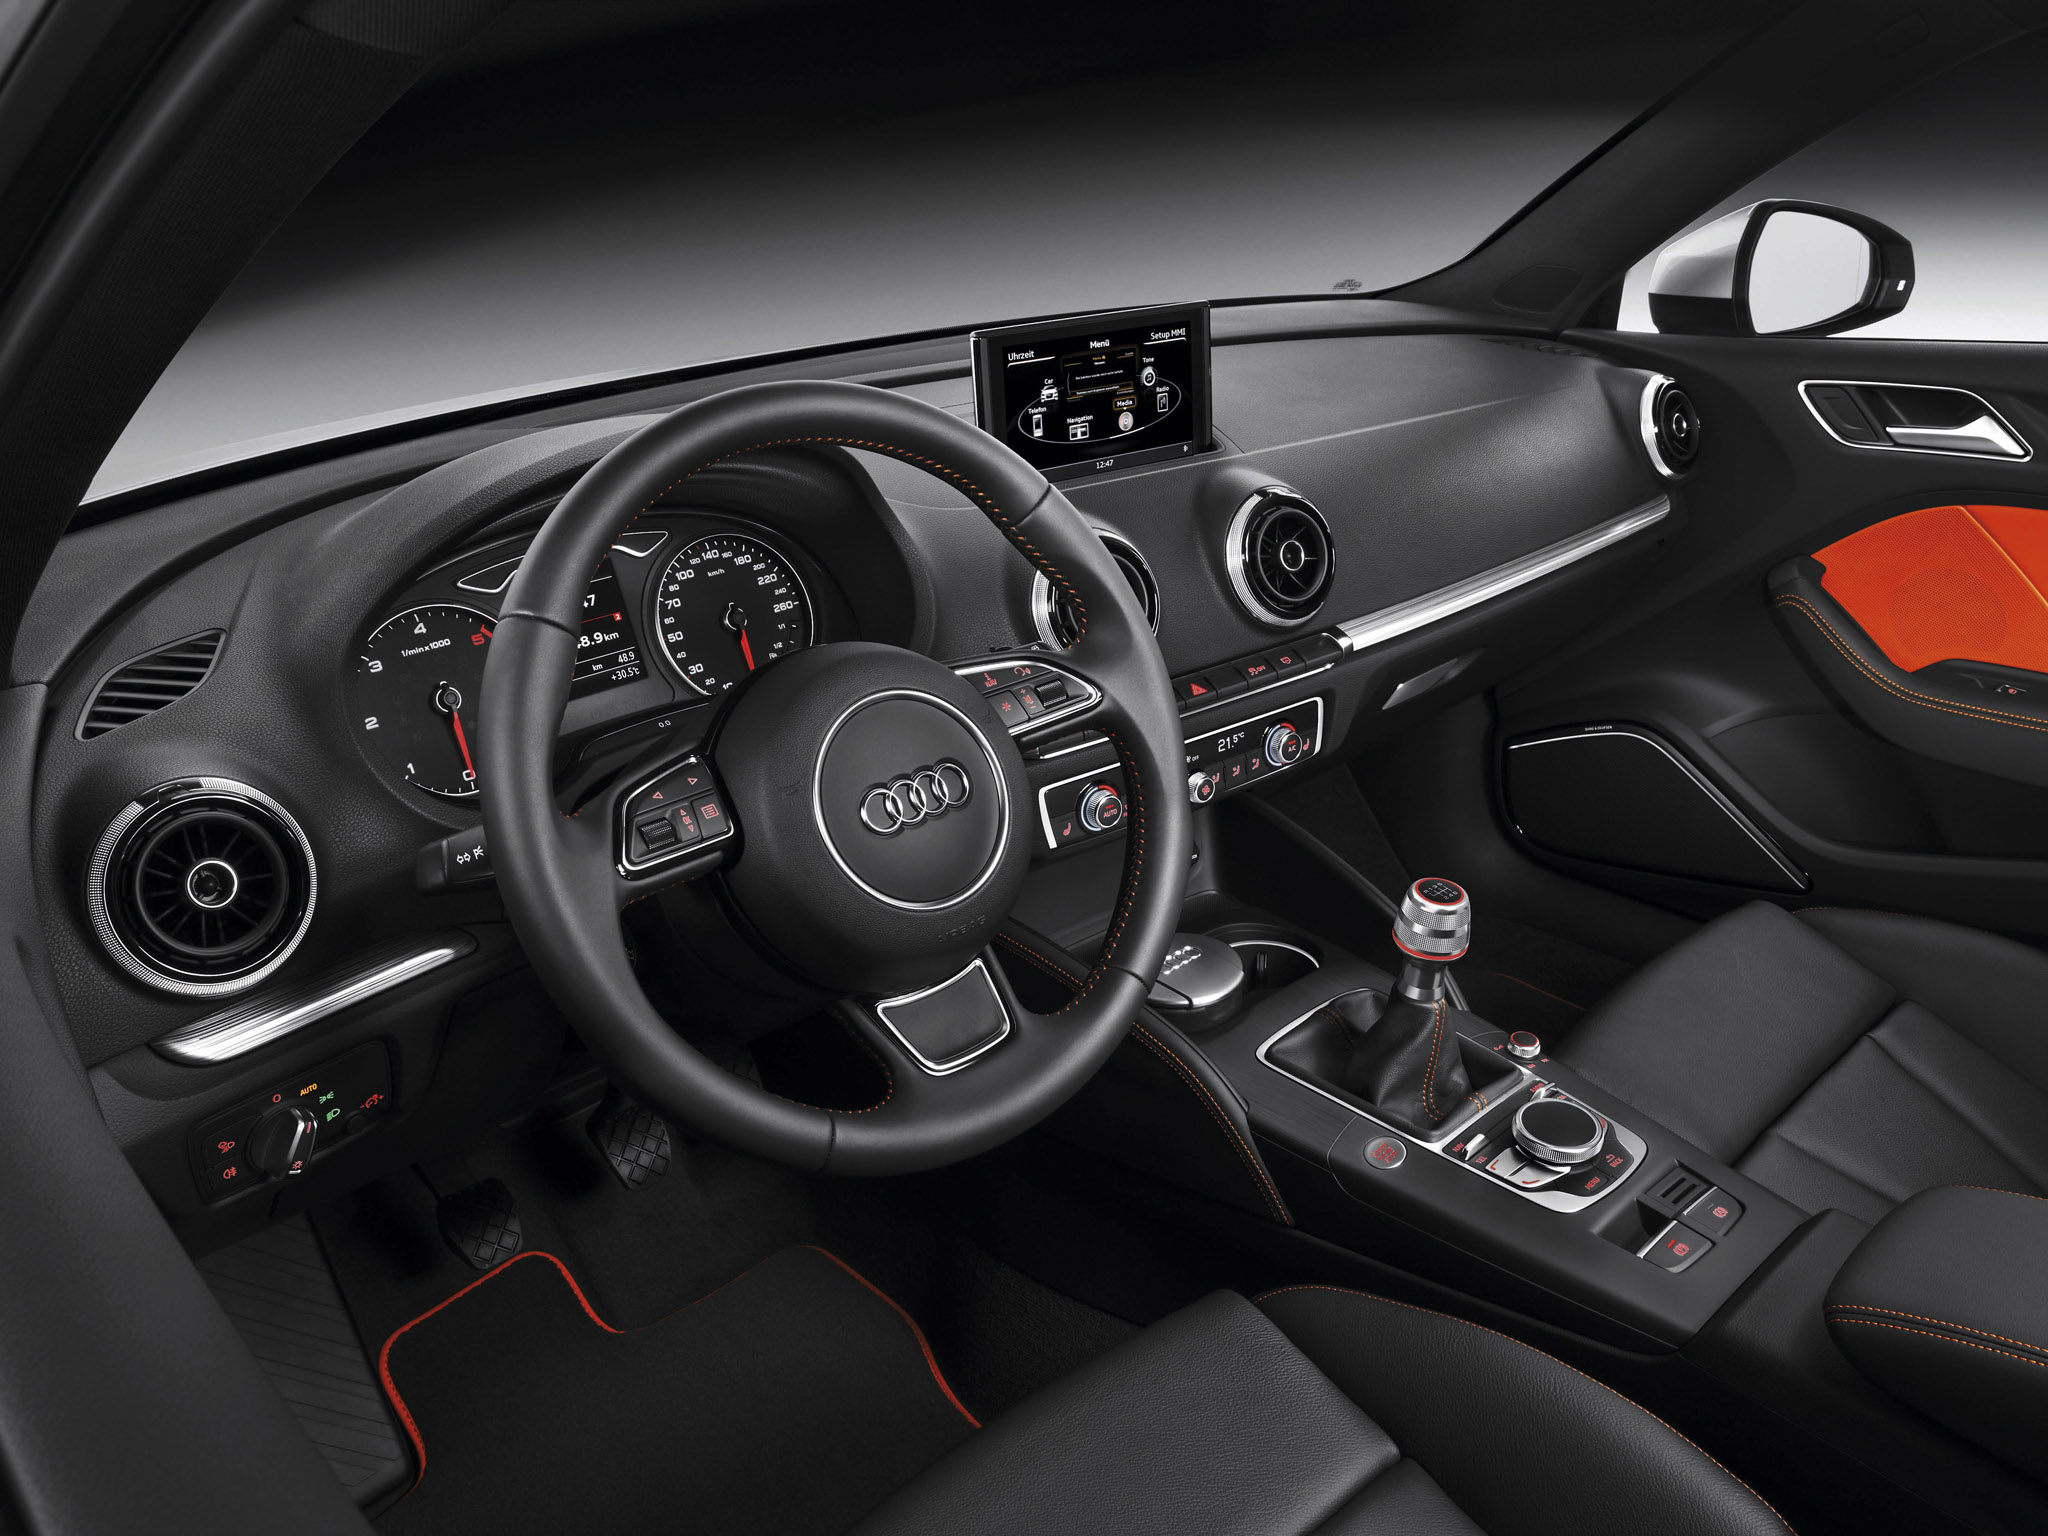 Audi A3 Sportback 2 0 Tdi S Line 2013 Audi A3 Sportback 2